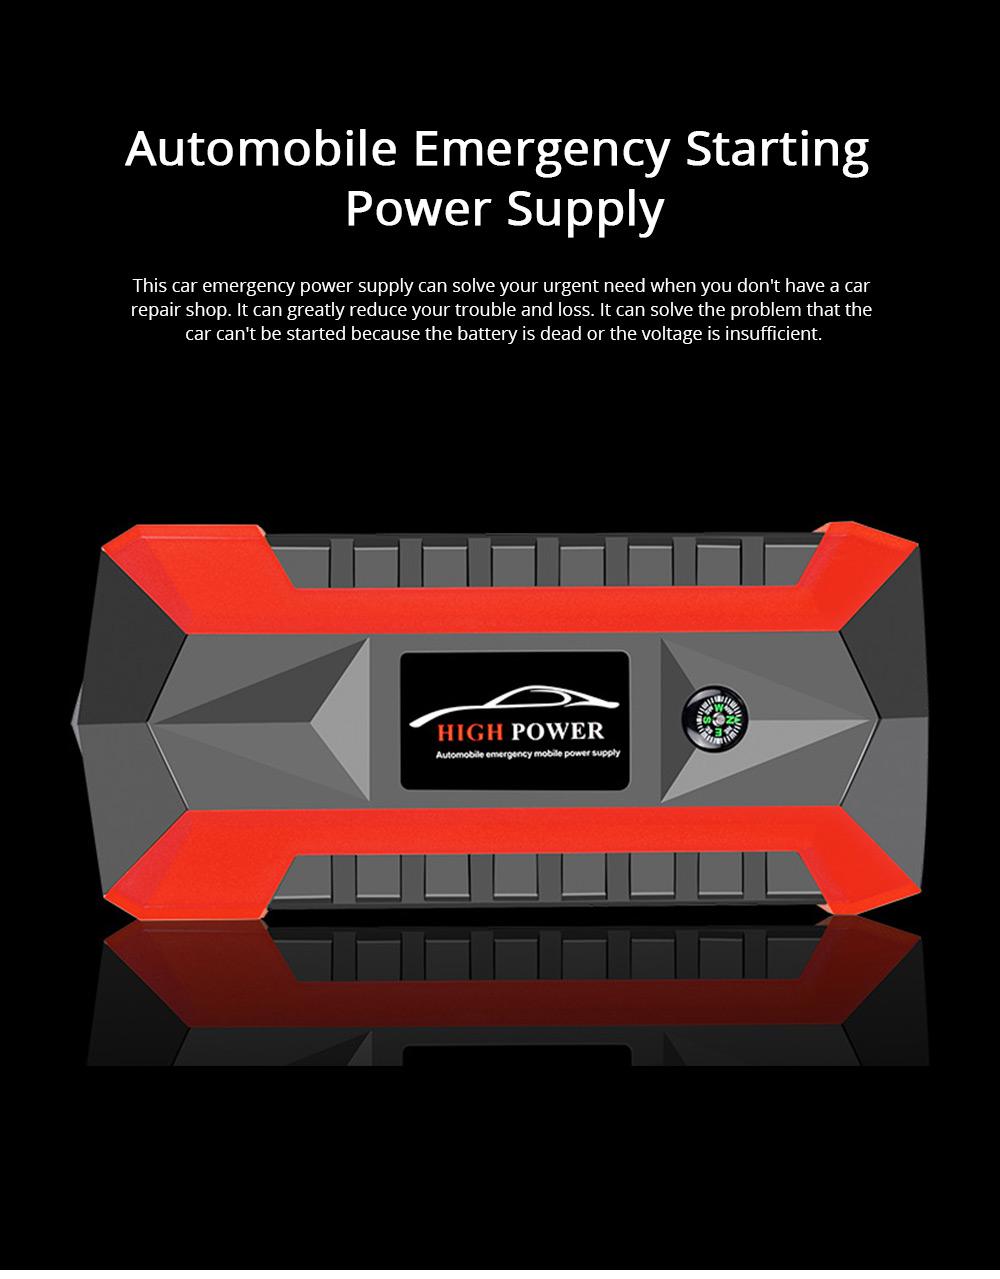 Automobile Emergency Starting Power Supply Automobile Diesel Gasoline Dual Start Standby Power Supply 0